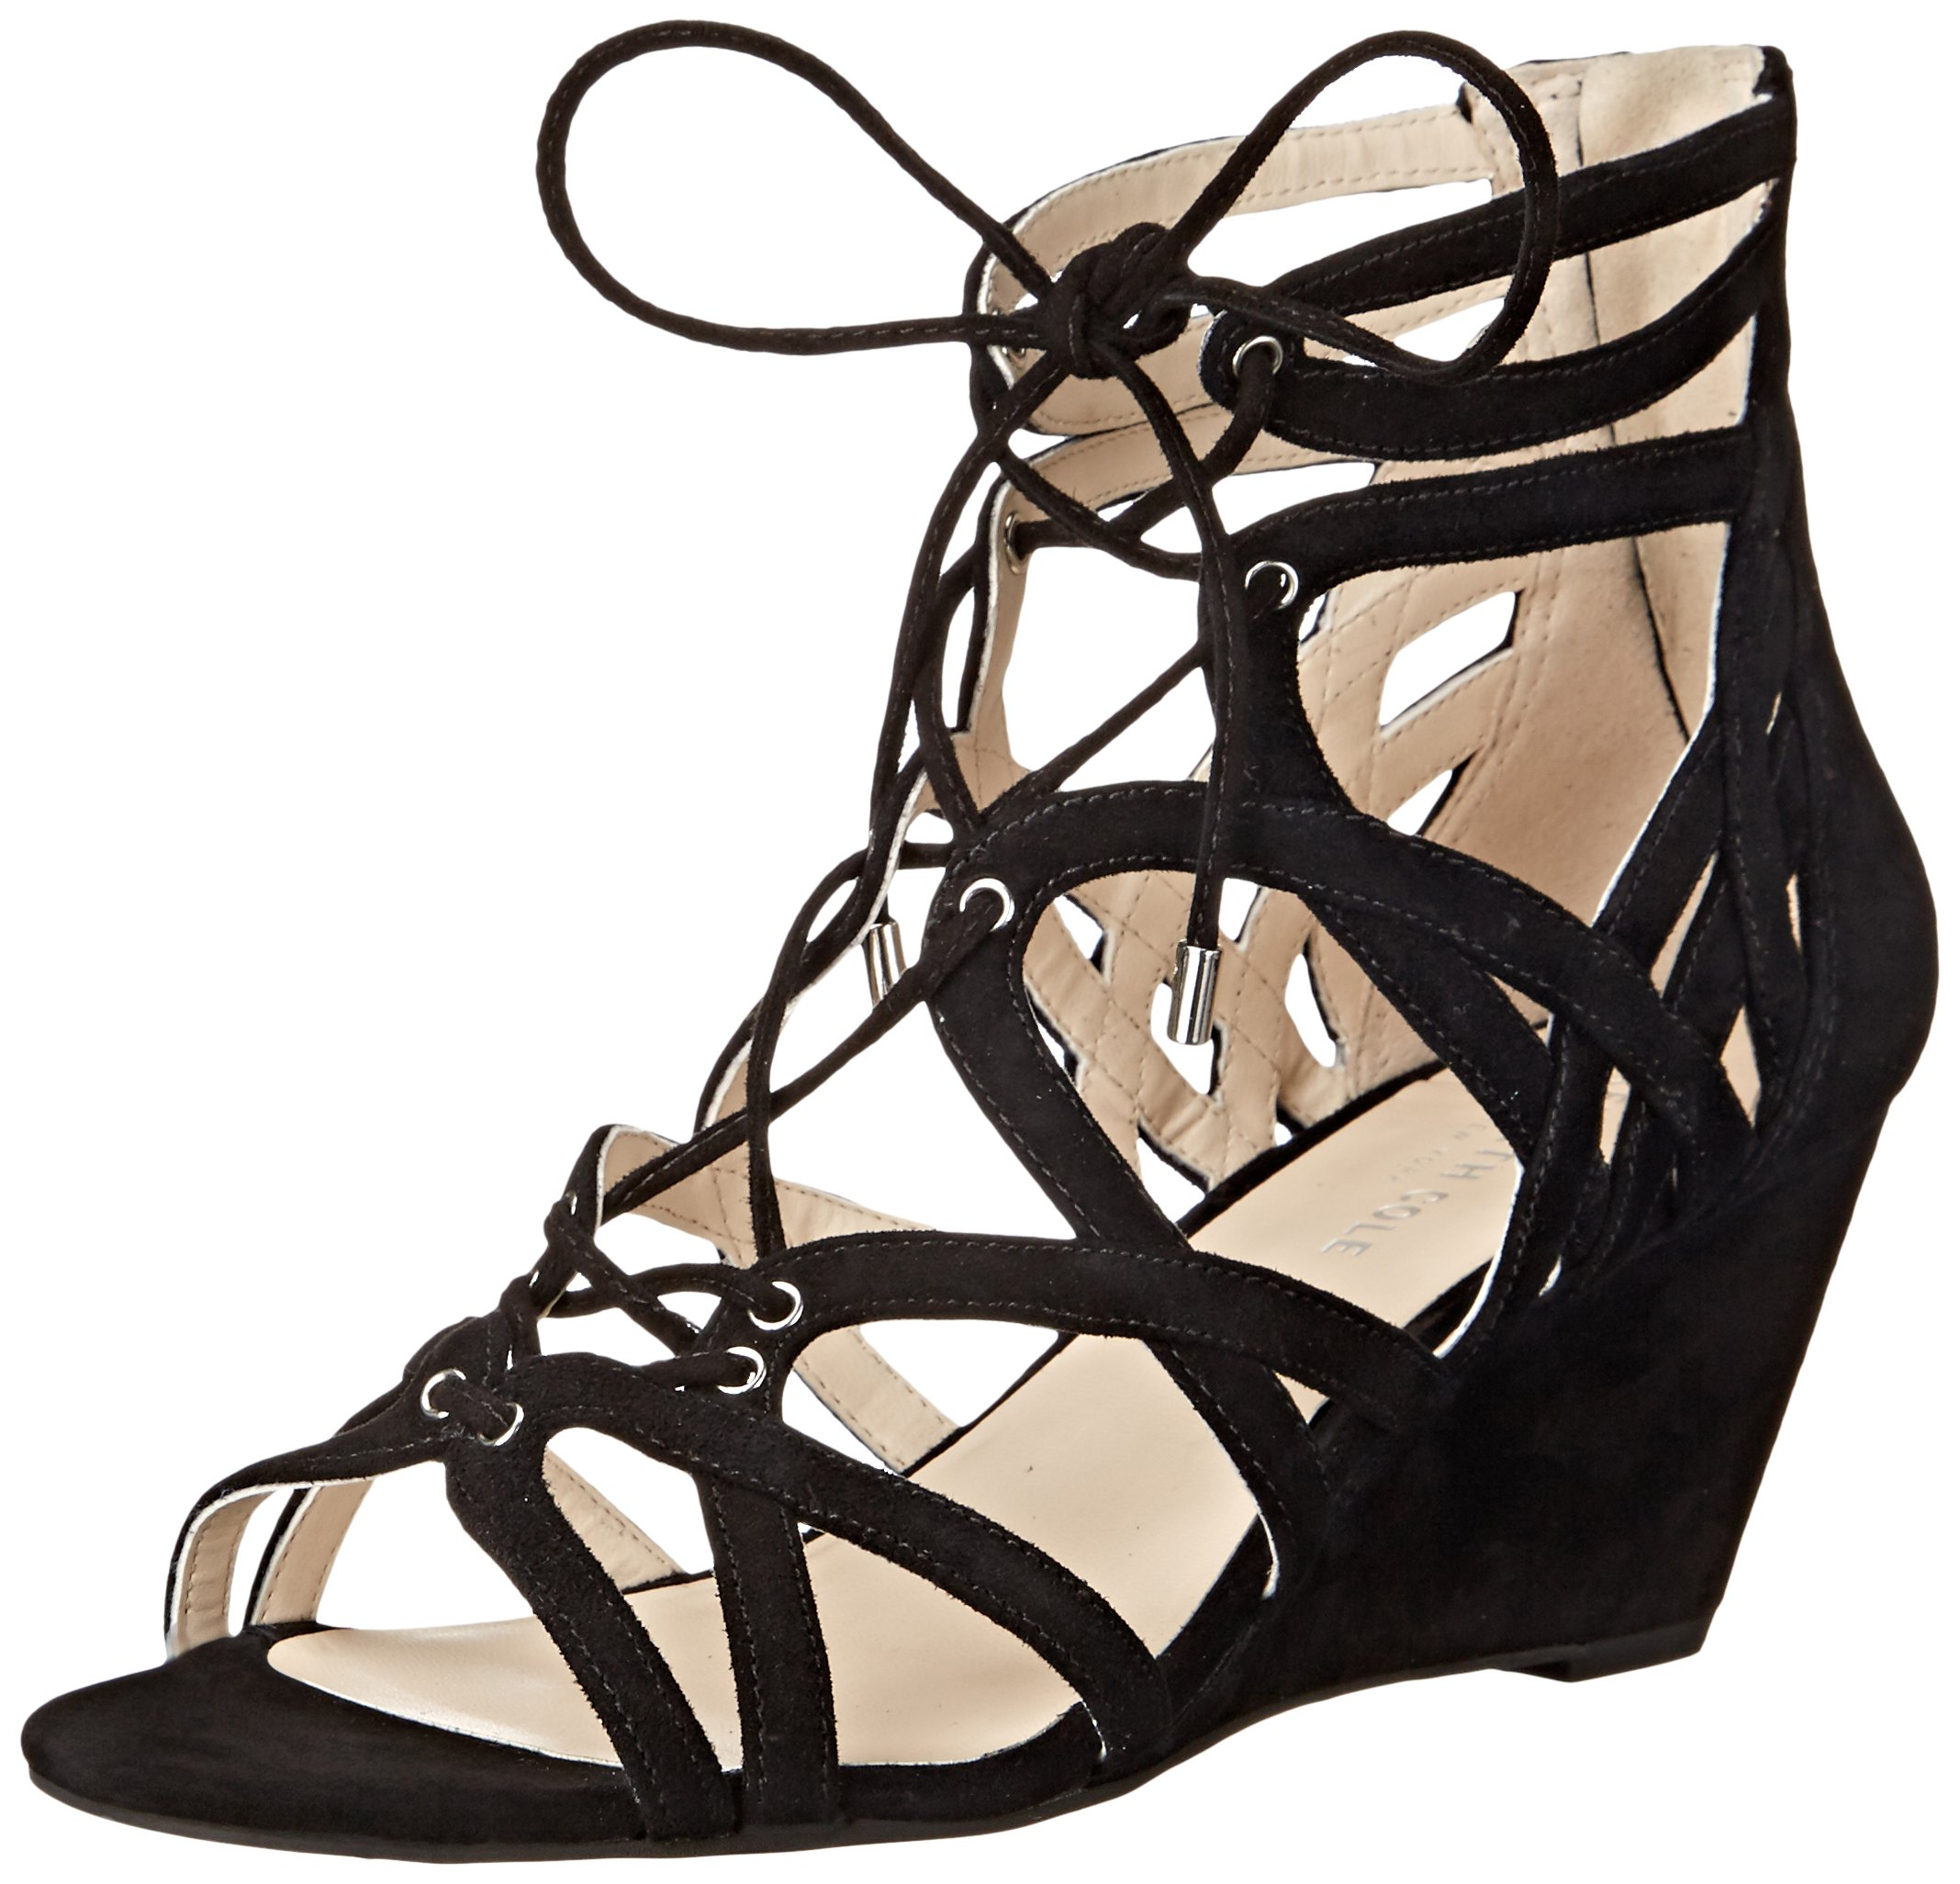 Kenneth Cole New York Women's Dylan Wedge Sandal, Black, 8 M US